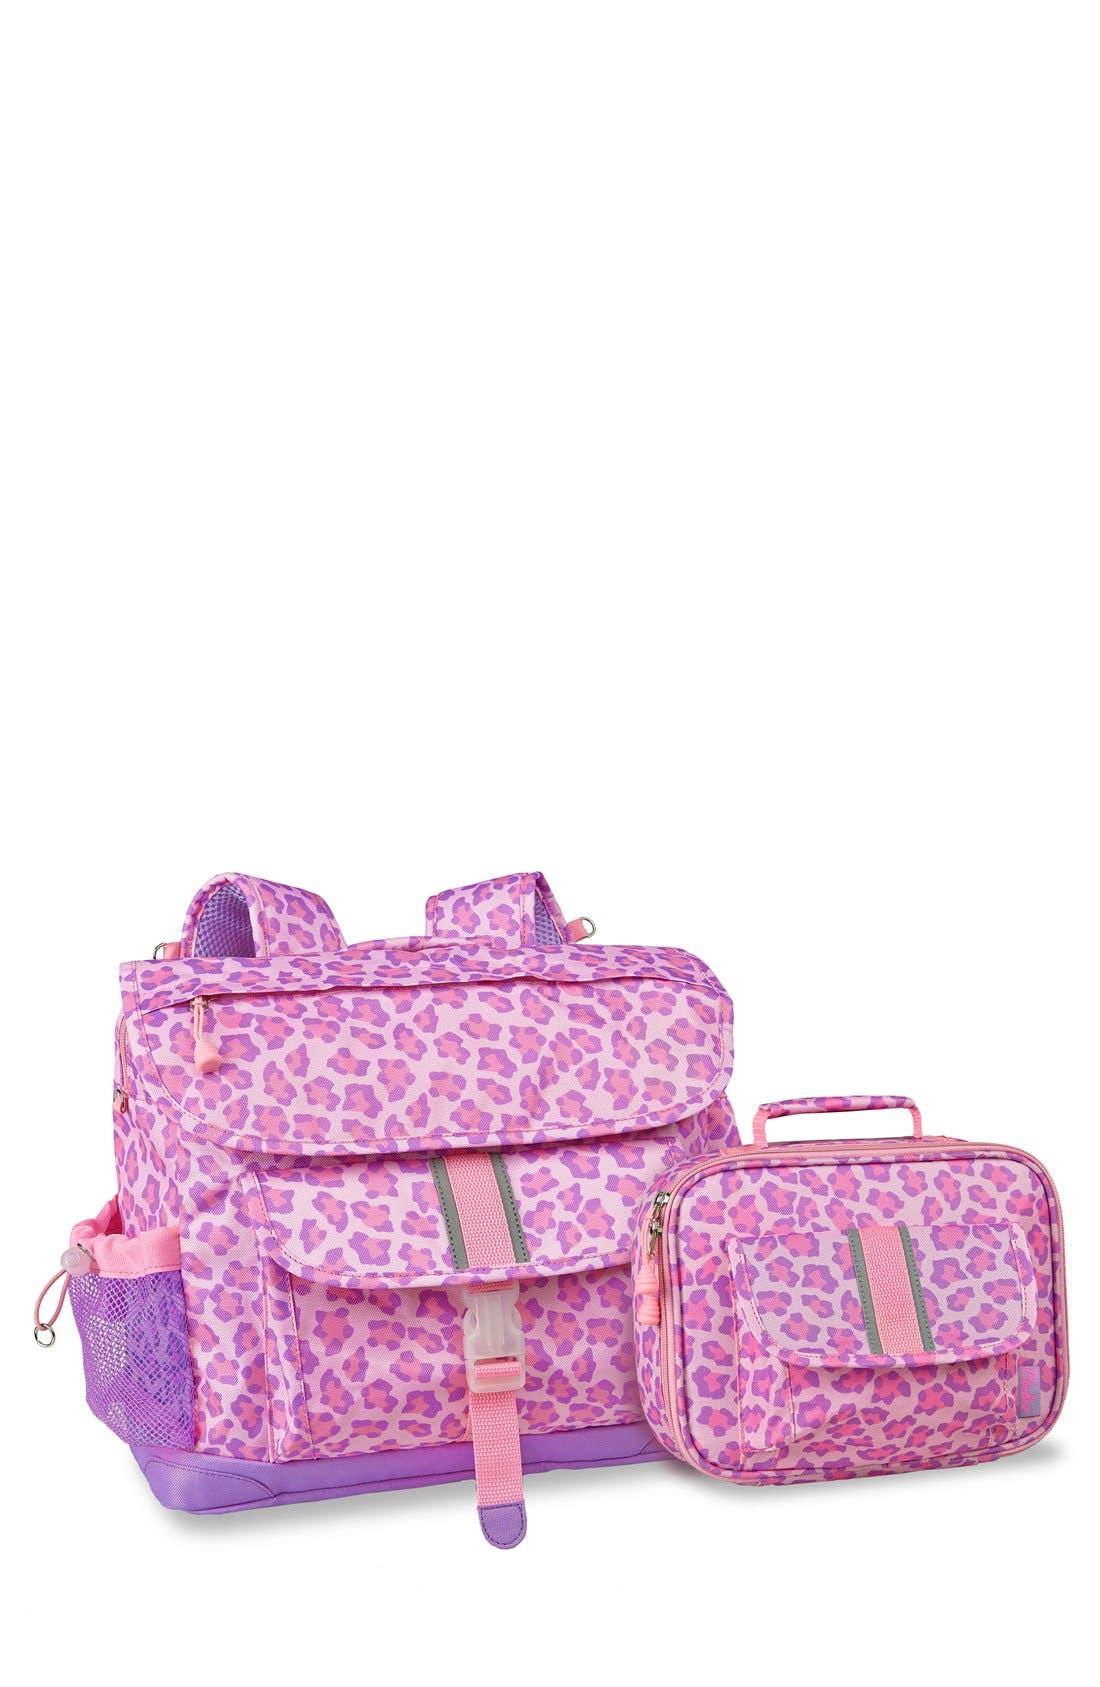 BIXBEE 'Sassy Spots' Leopard Print Backpack & Lunchbox